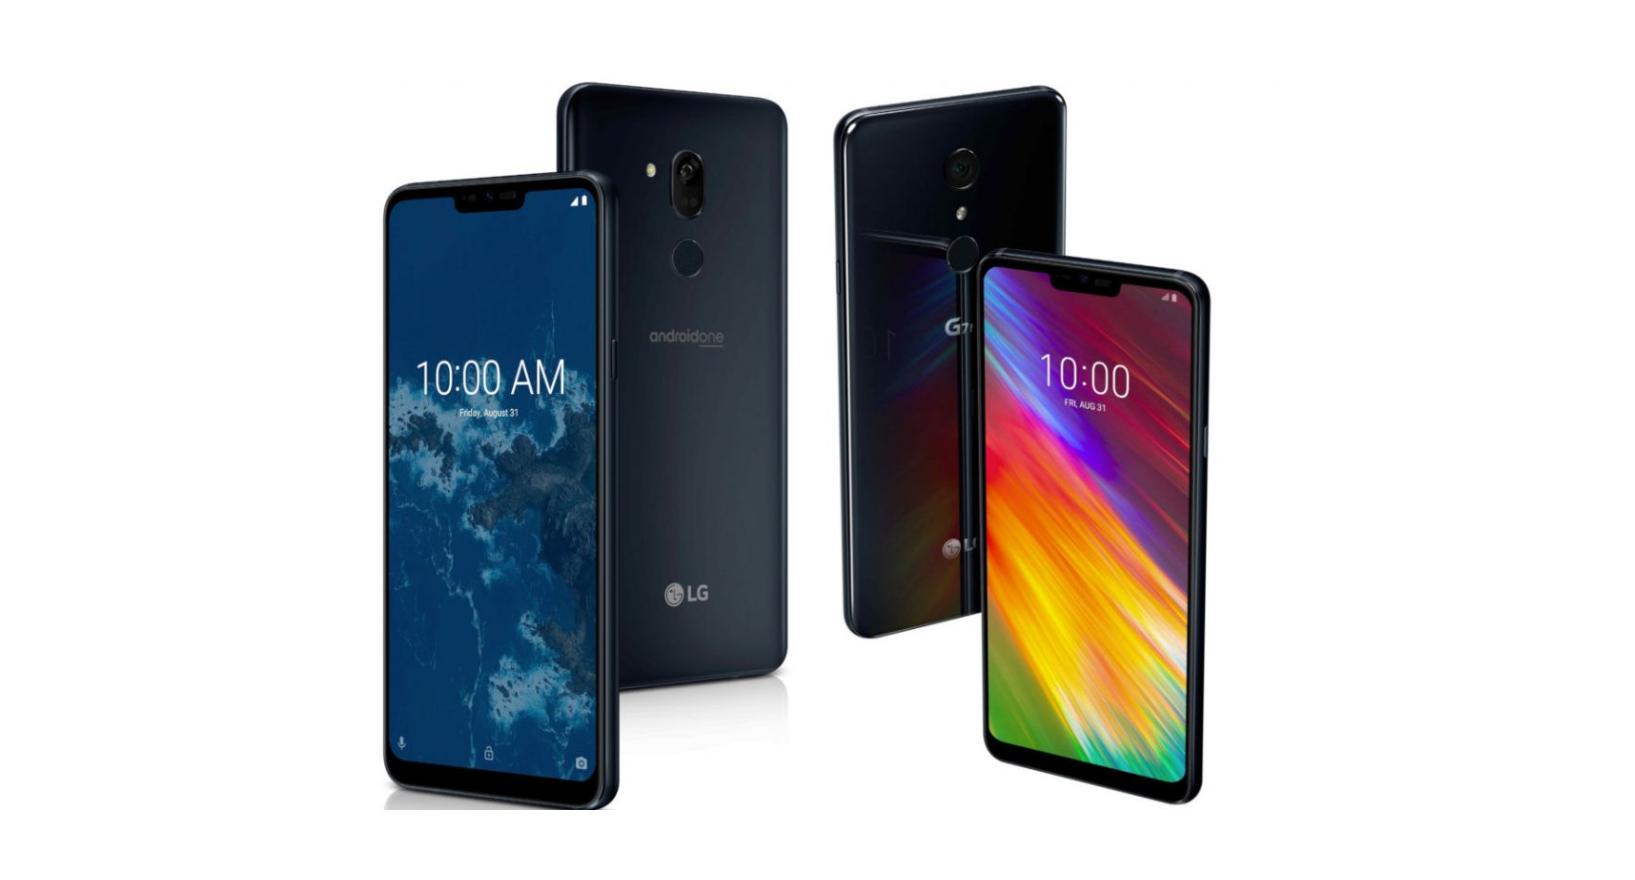 LG G7 One je první mobil od LG s Android One